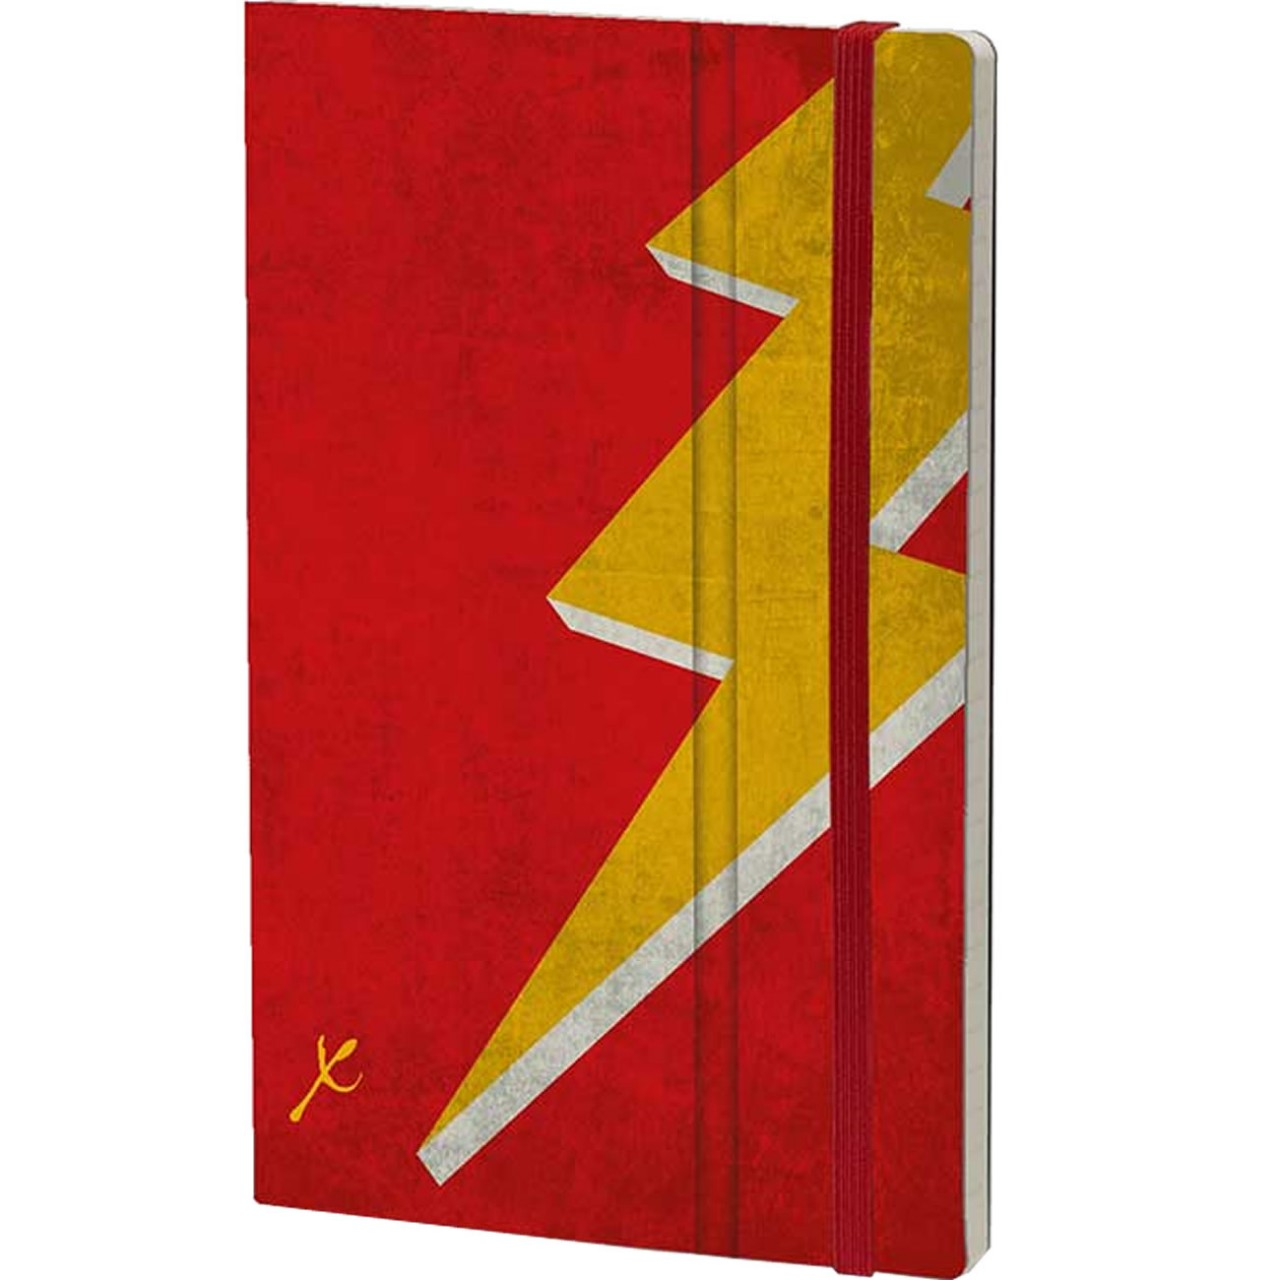 Stifflexible Notizbuch ICON 13 x 21 cm 192 S., LIGHTENING